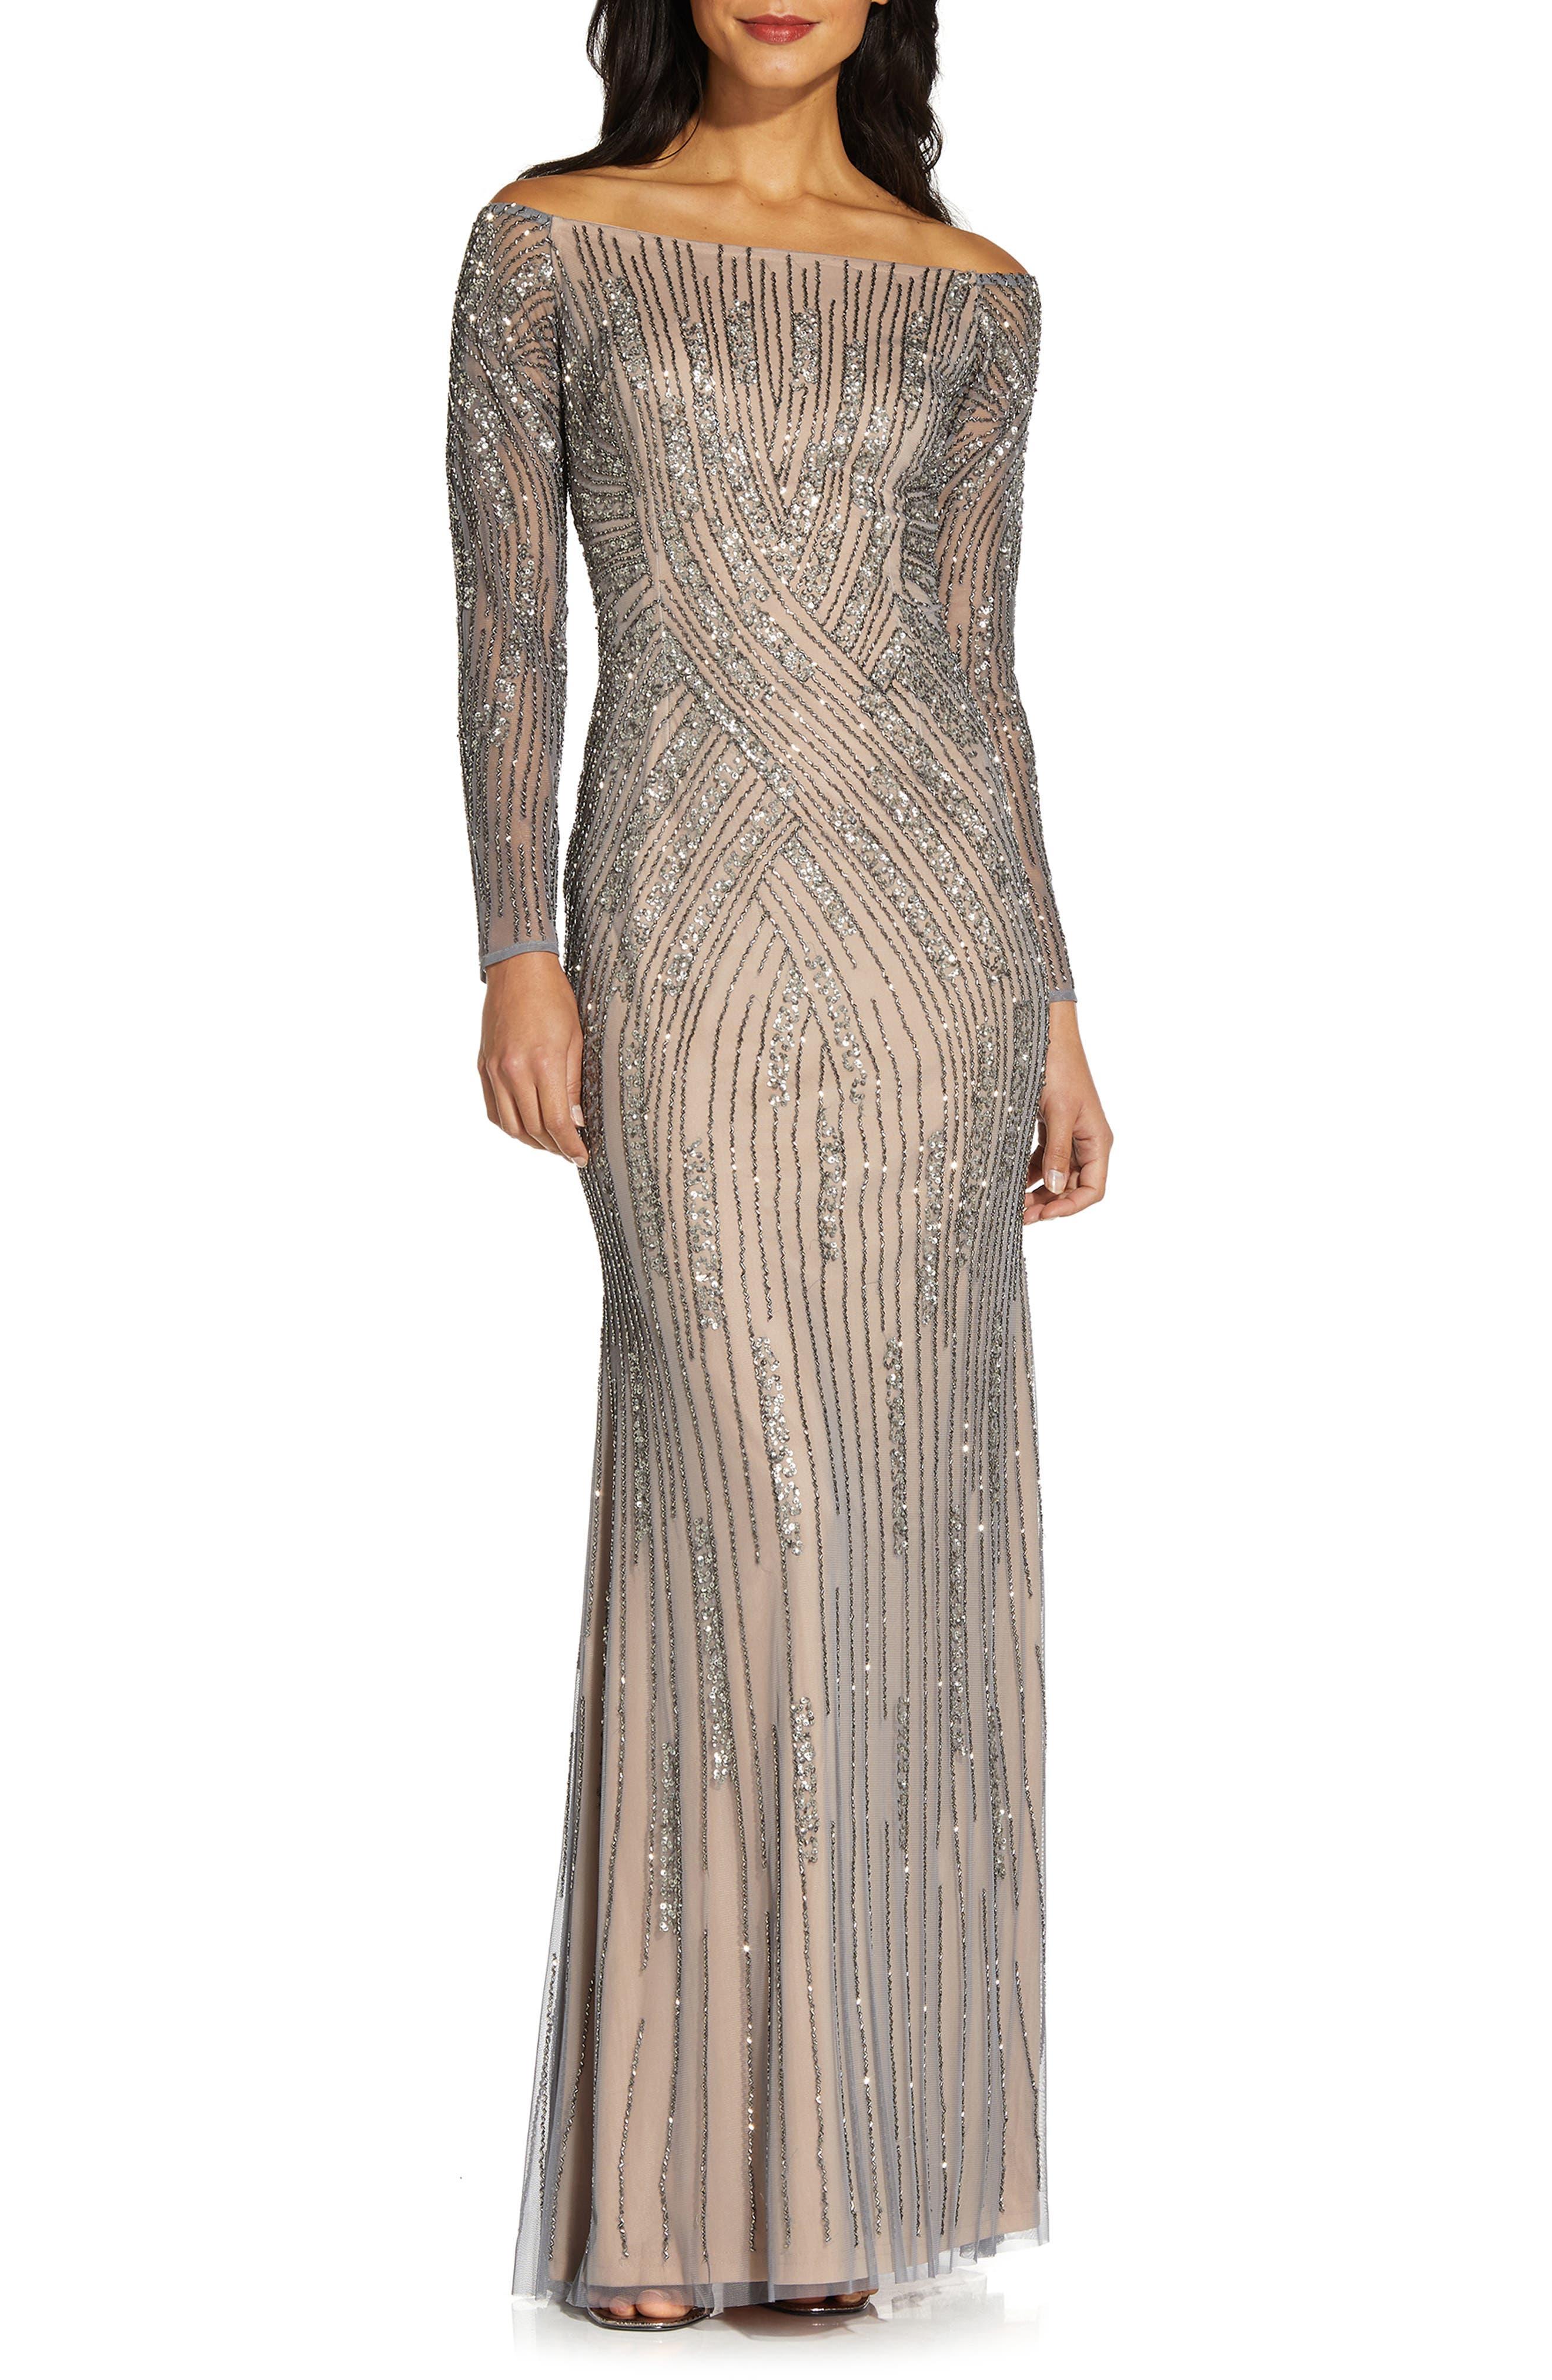 Long Sleeve Off The Shoulder Beaded Mermaid Gown